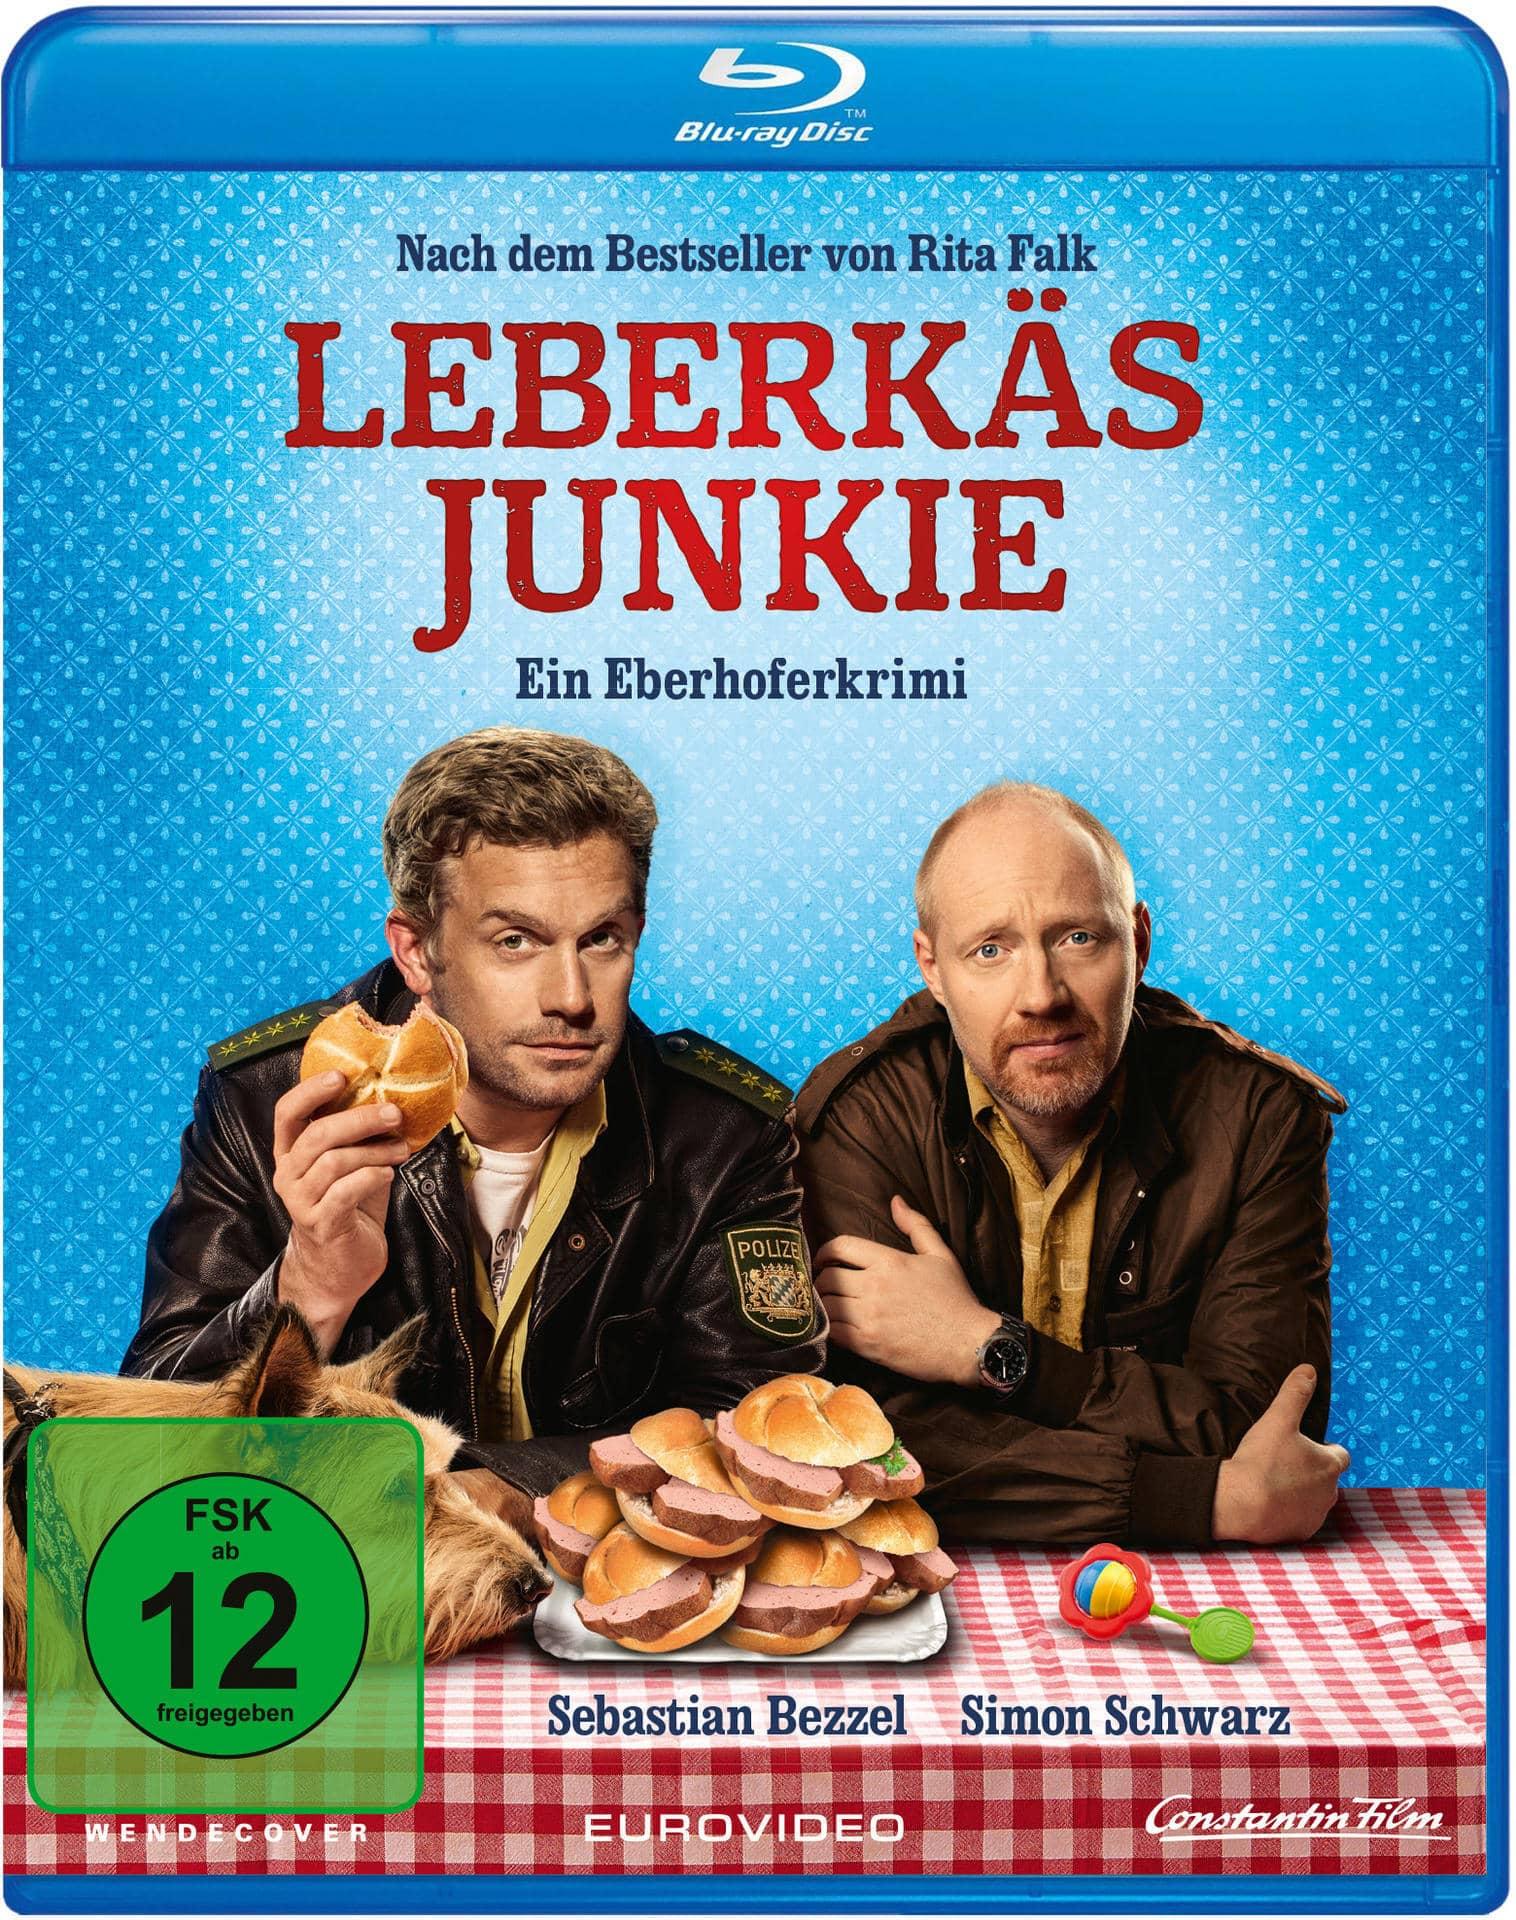 Leberkäsjunkie (BLU-RAY) für 14,99 Euro